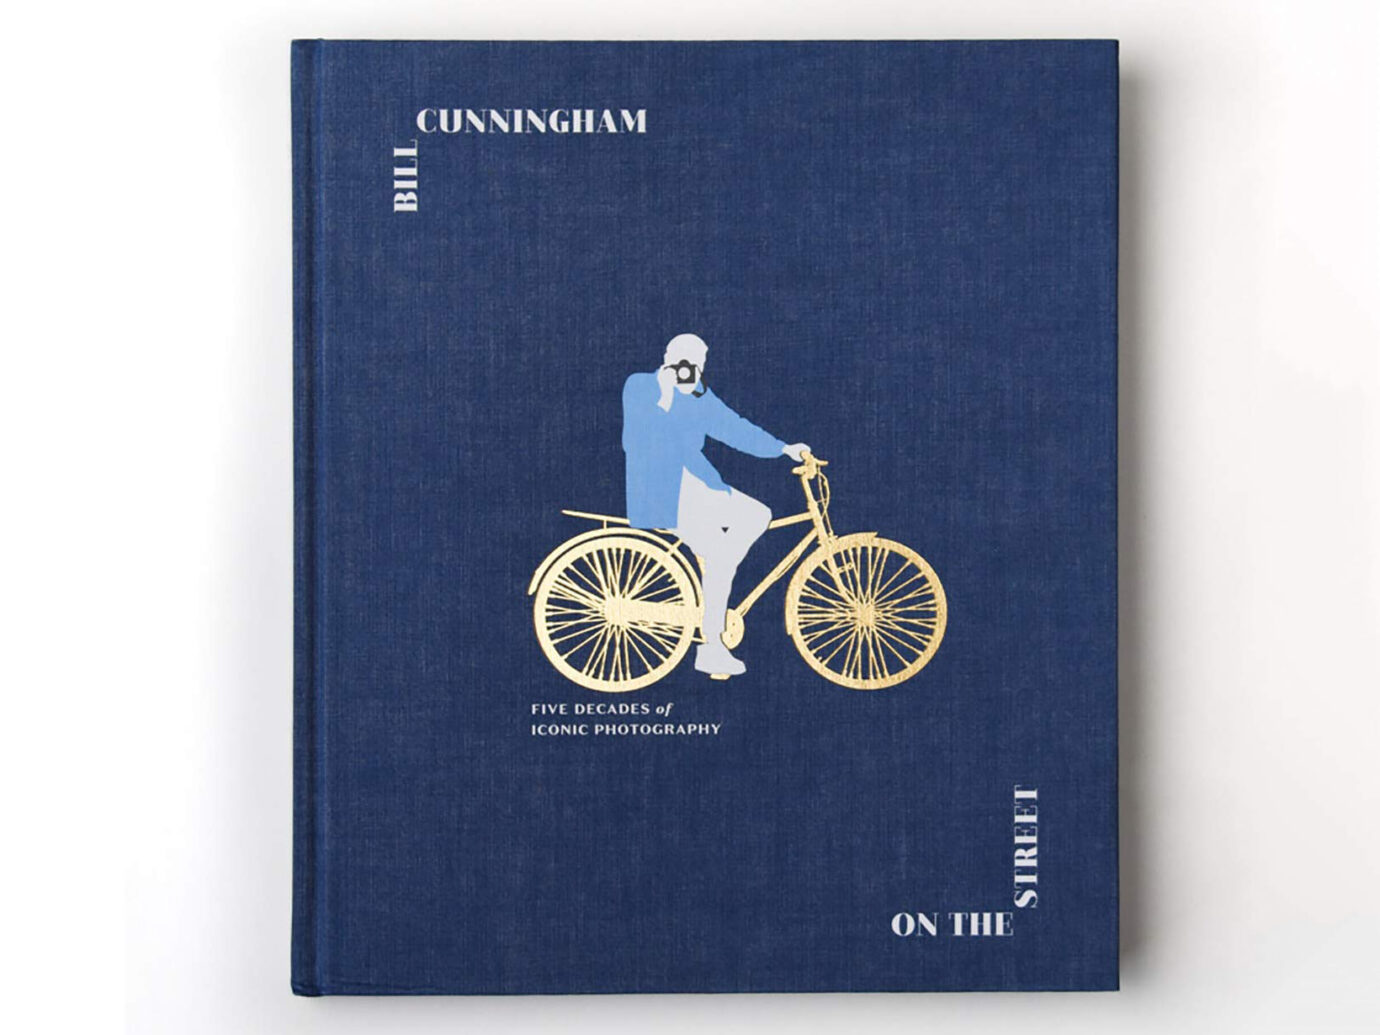 Bill Cunningham: On the Street